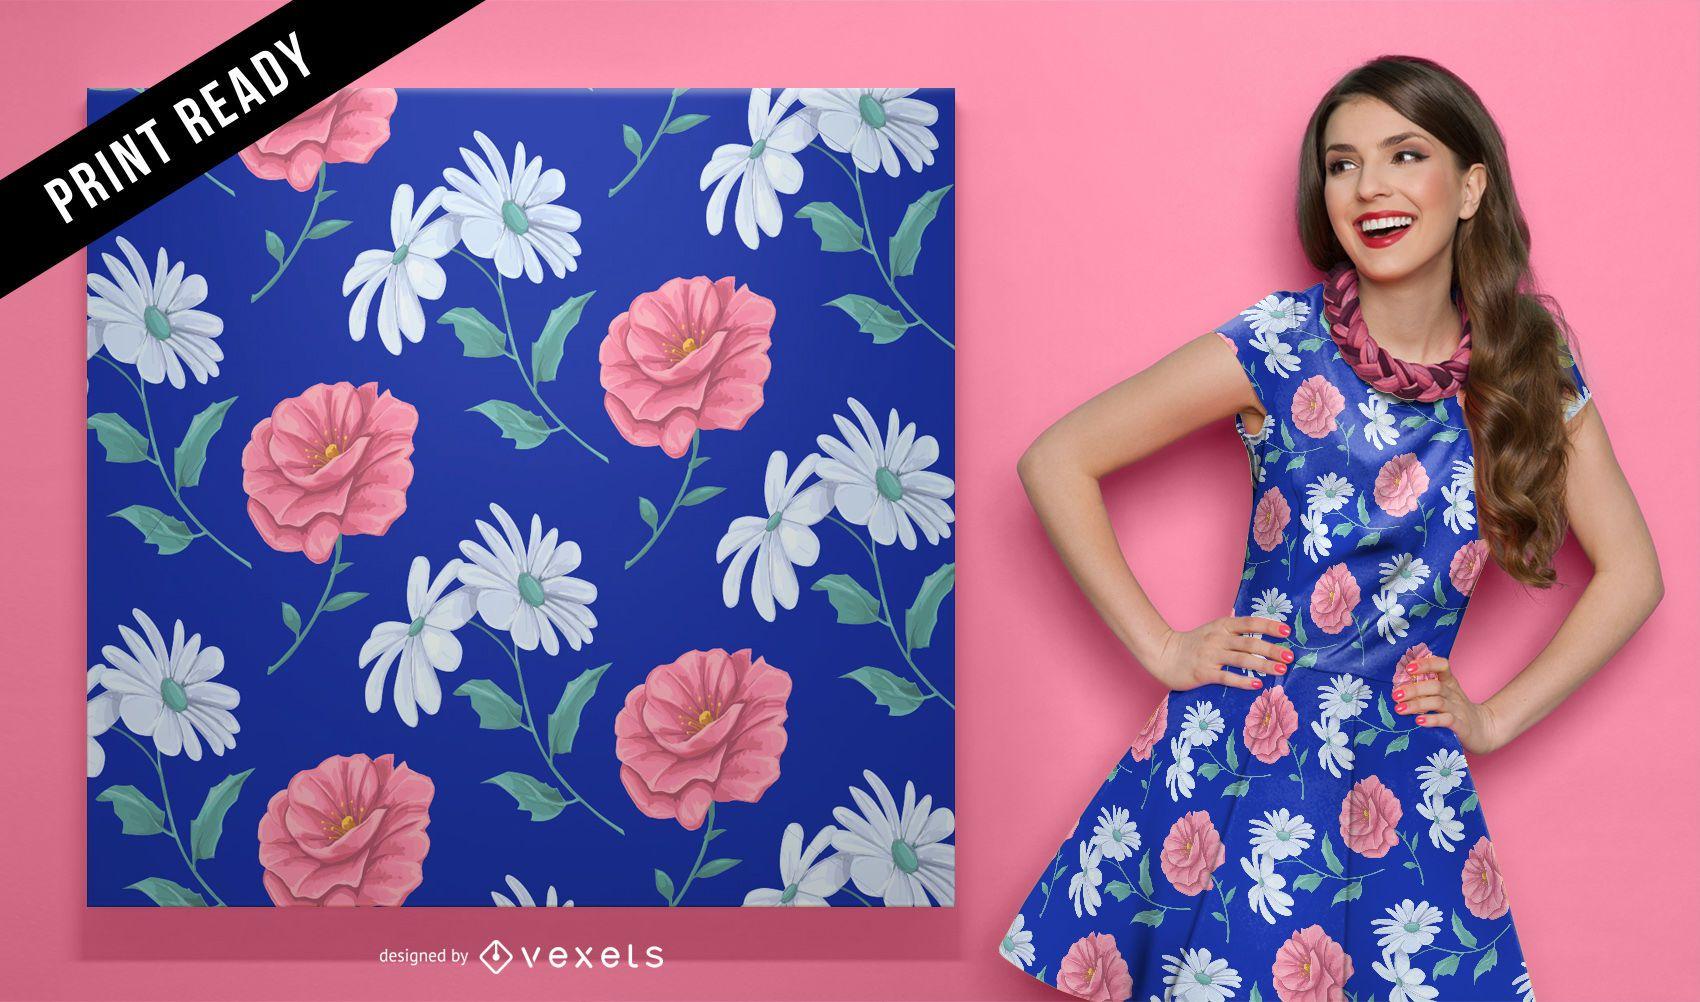 Daisy and rose seamless pattern